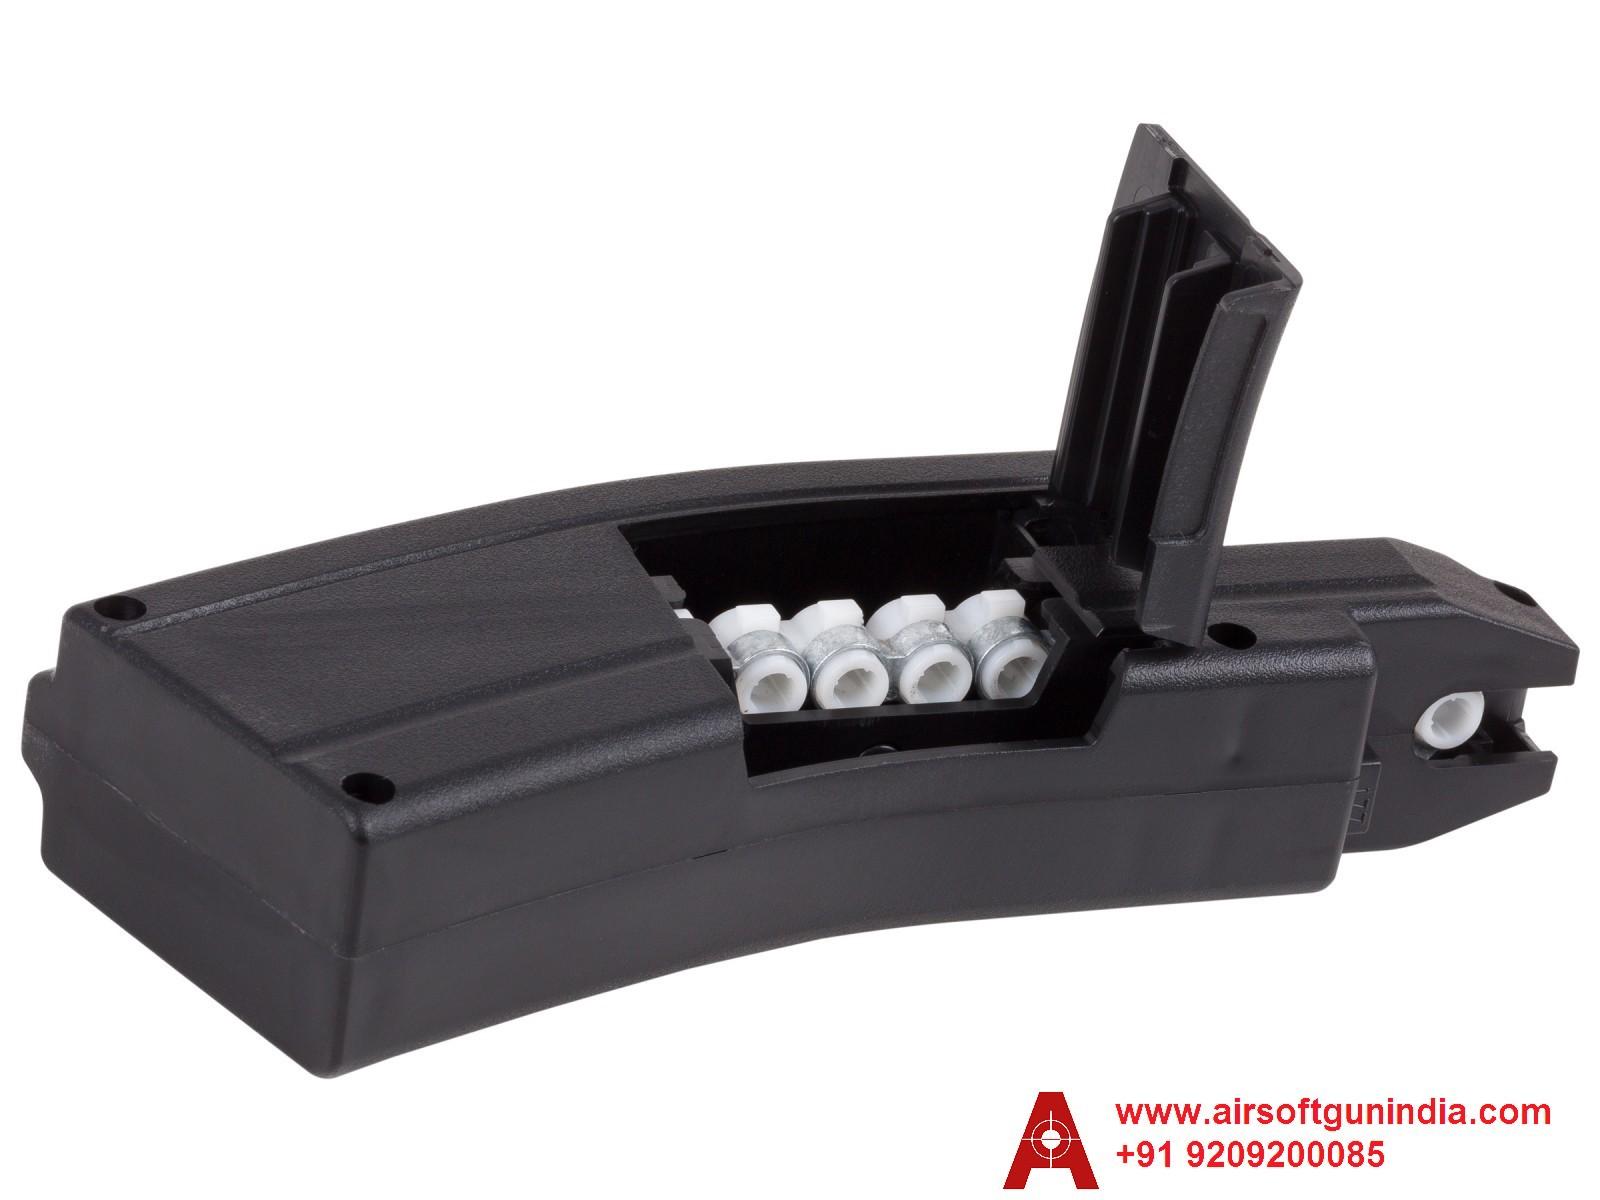 SIG Sauer MPX CO2 Pellet Rifle, Flat Dark Earth By Airsoft Gun India